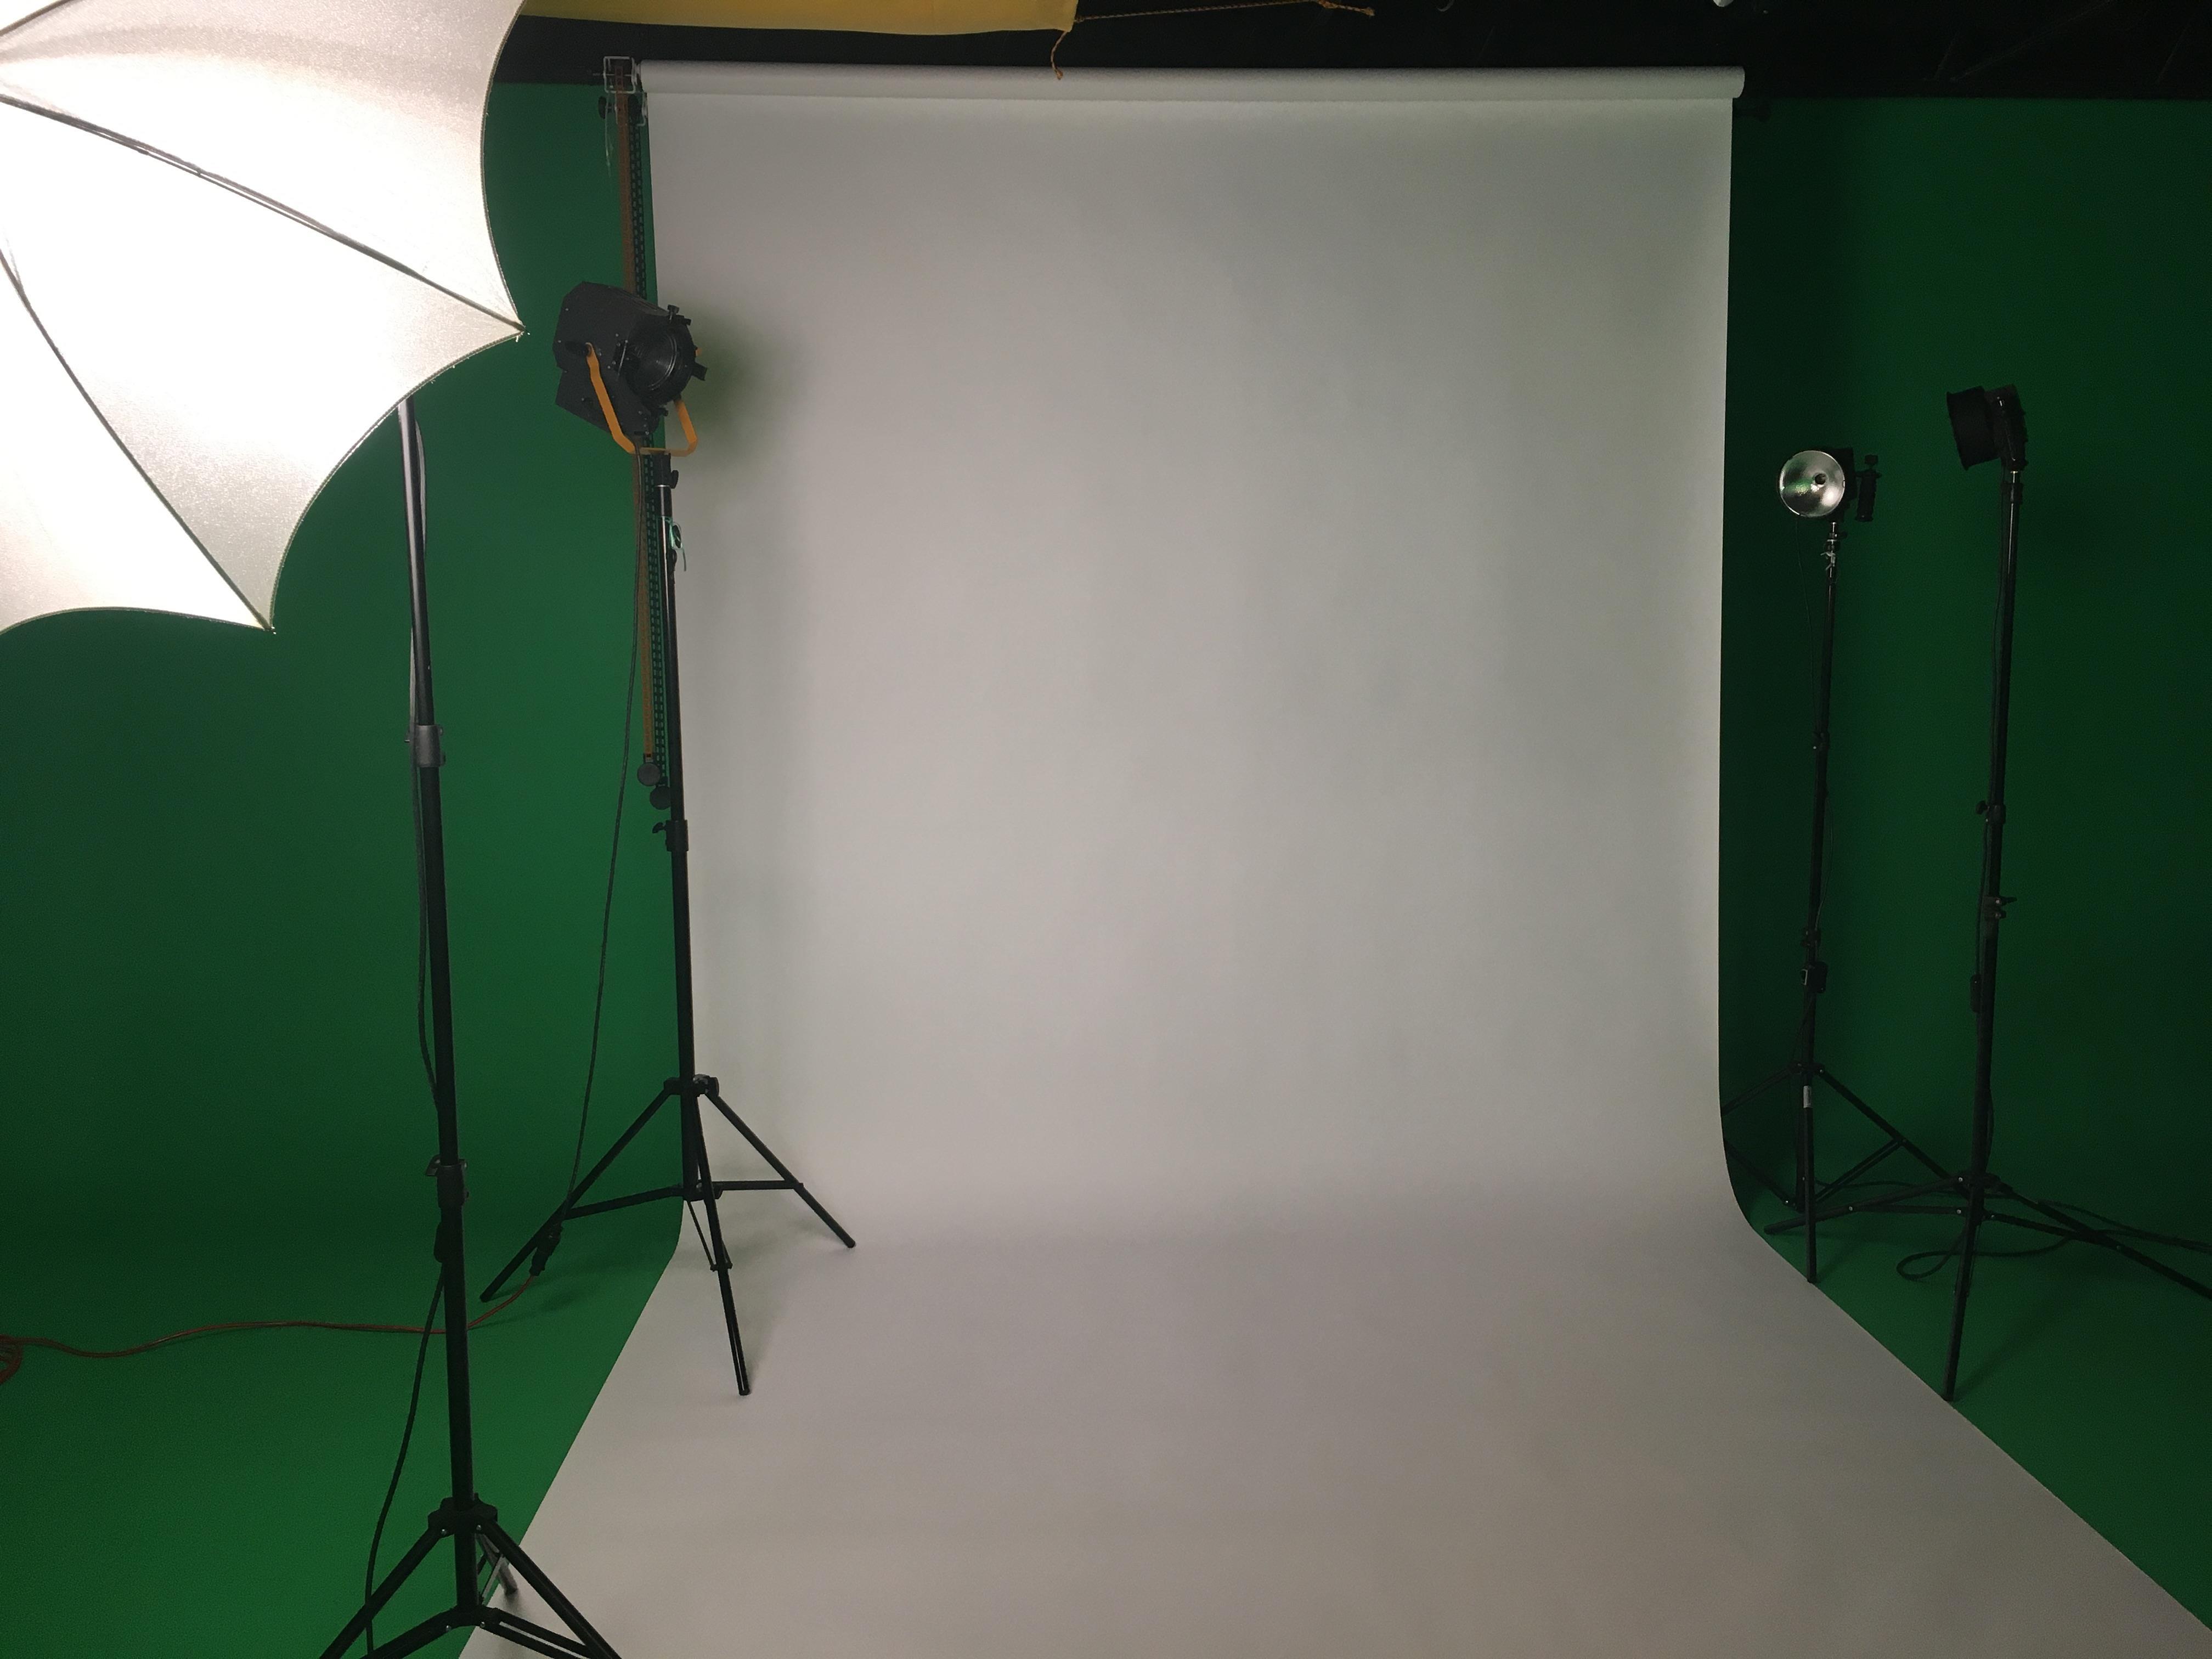 NTV America - Photo shoot space